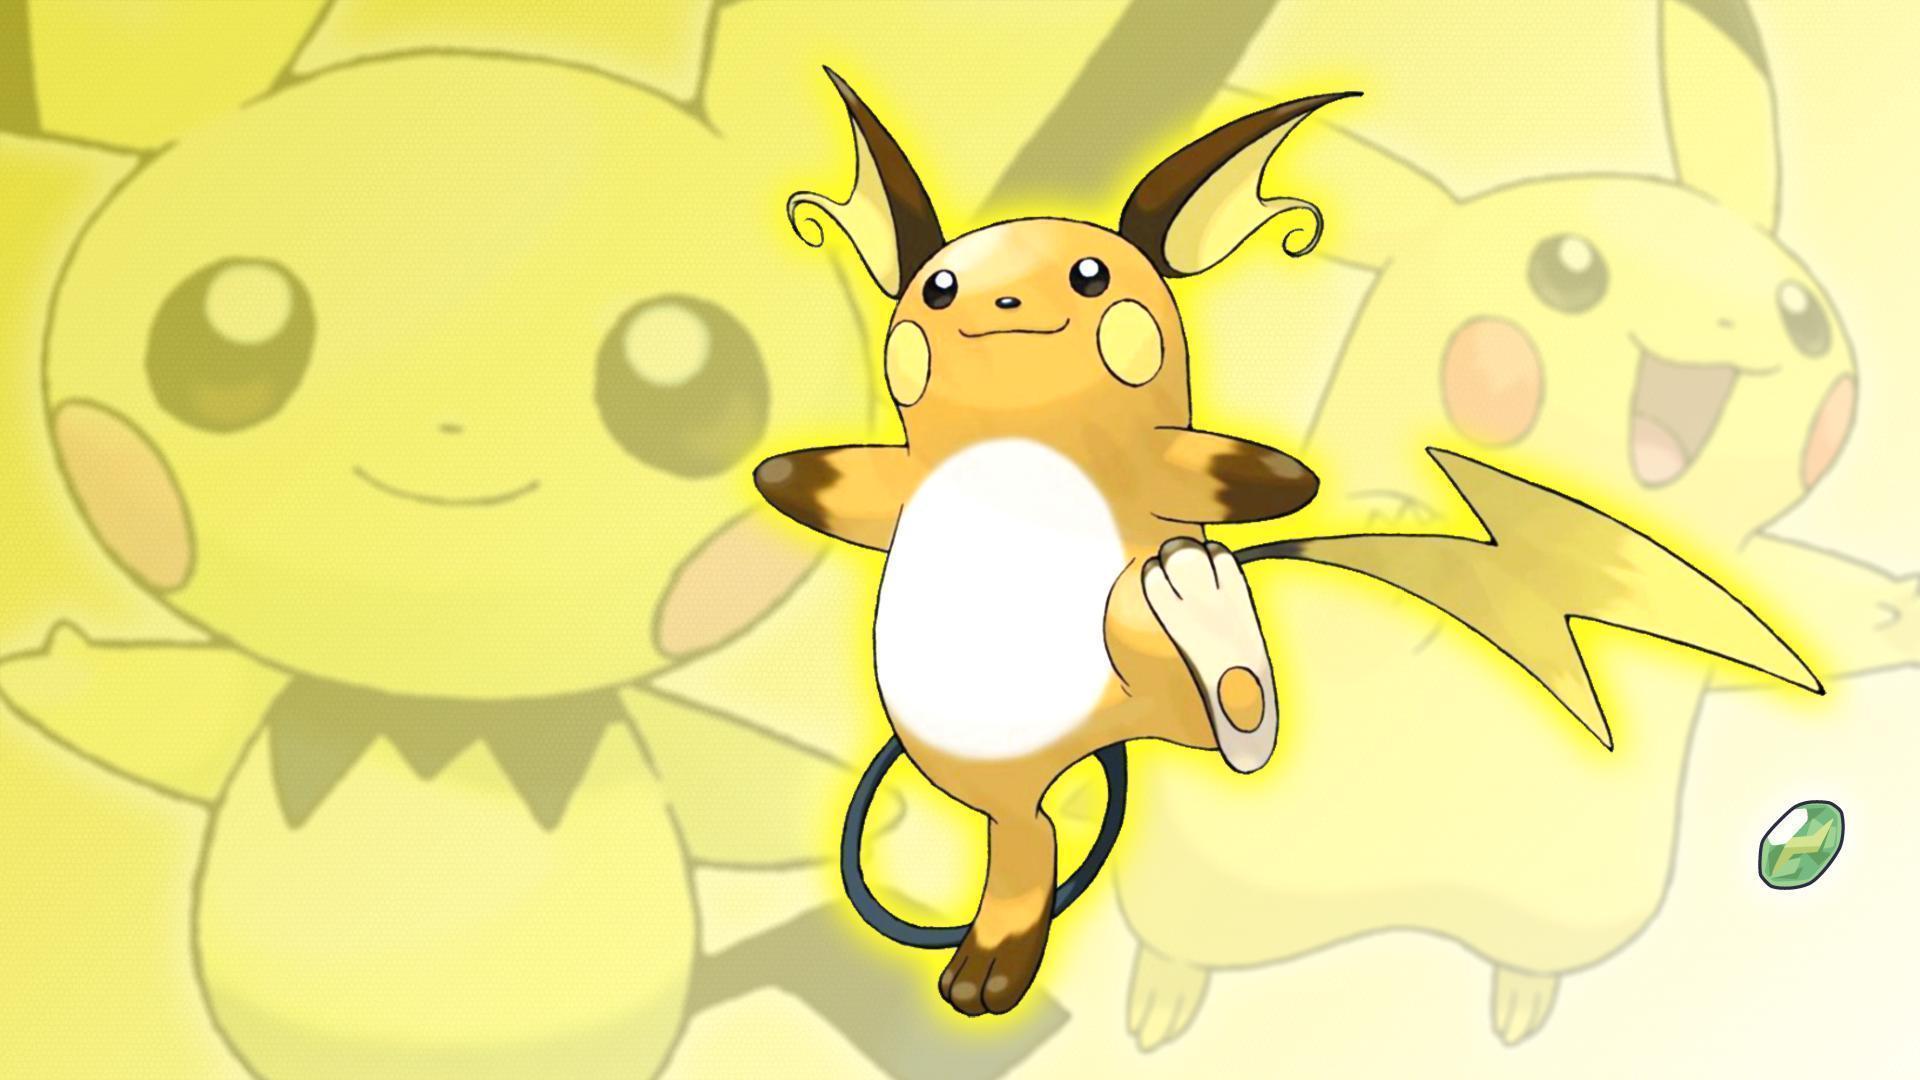 how to get alolan pikachu